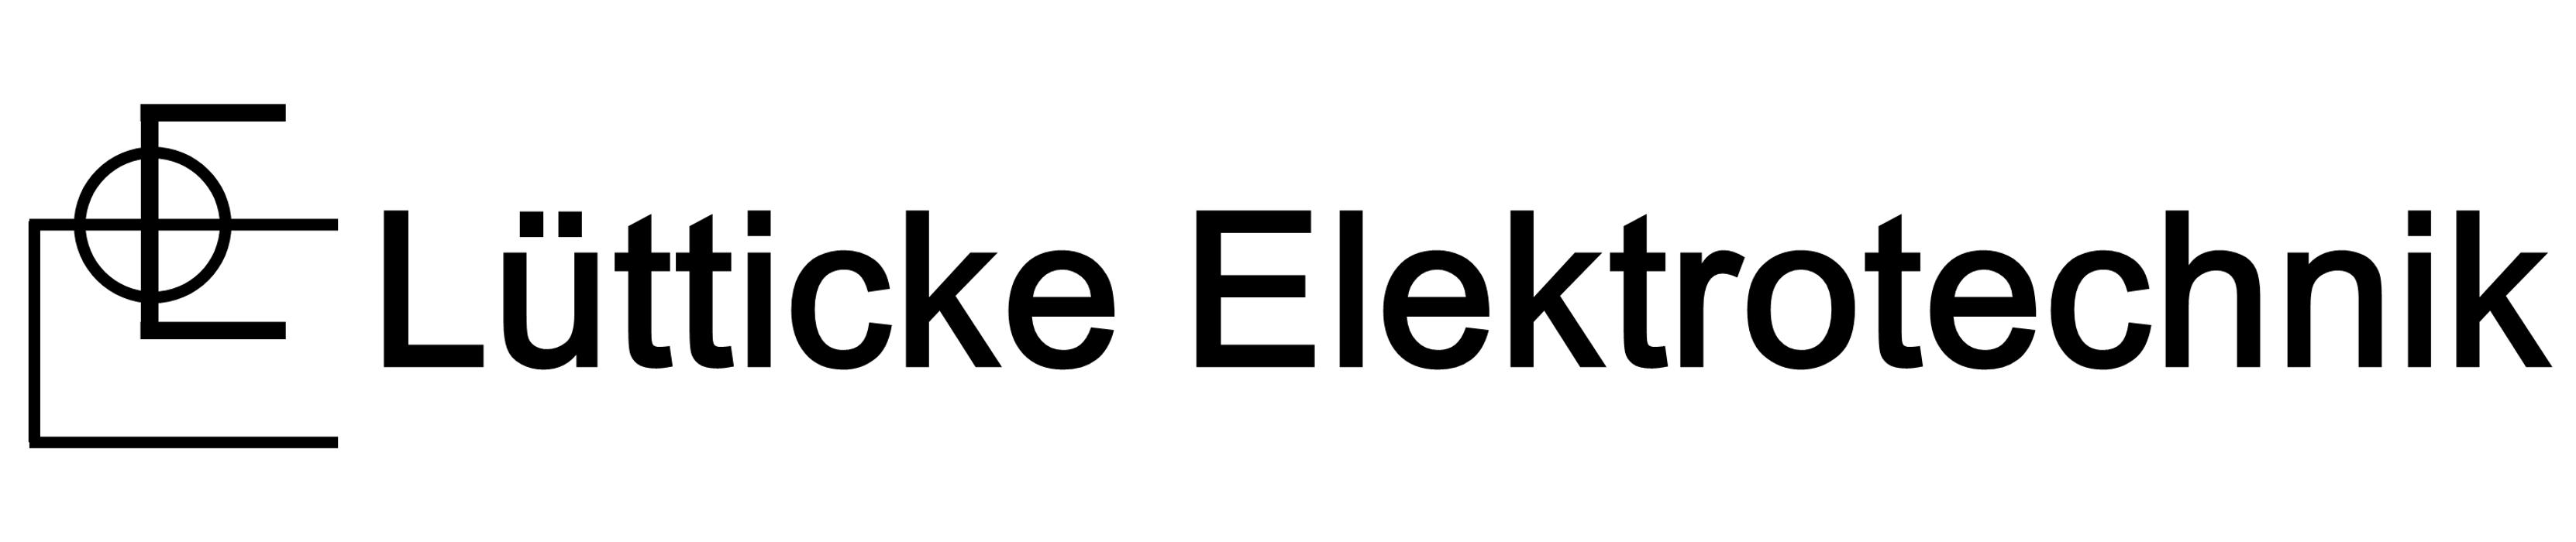 Bild zu Lütticke Elektrotechnik in Königswinter